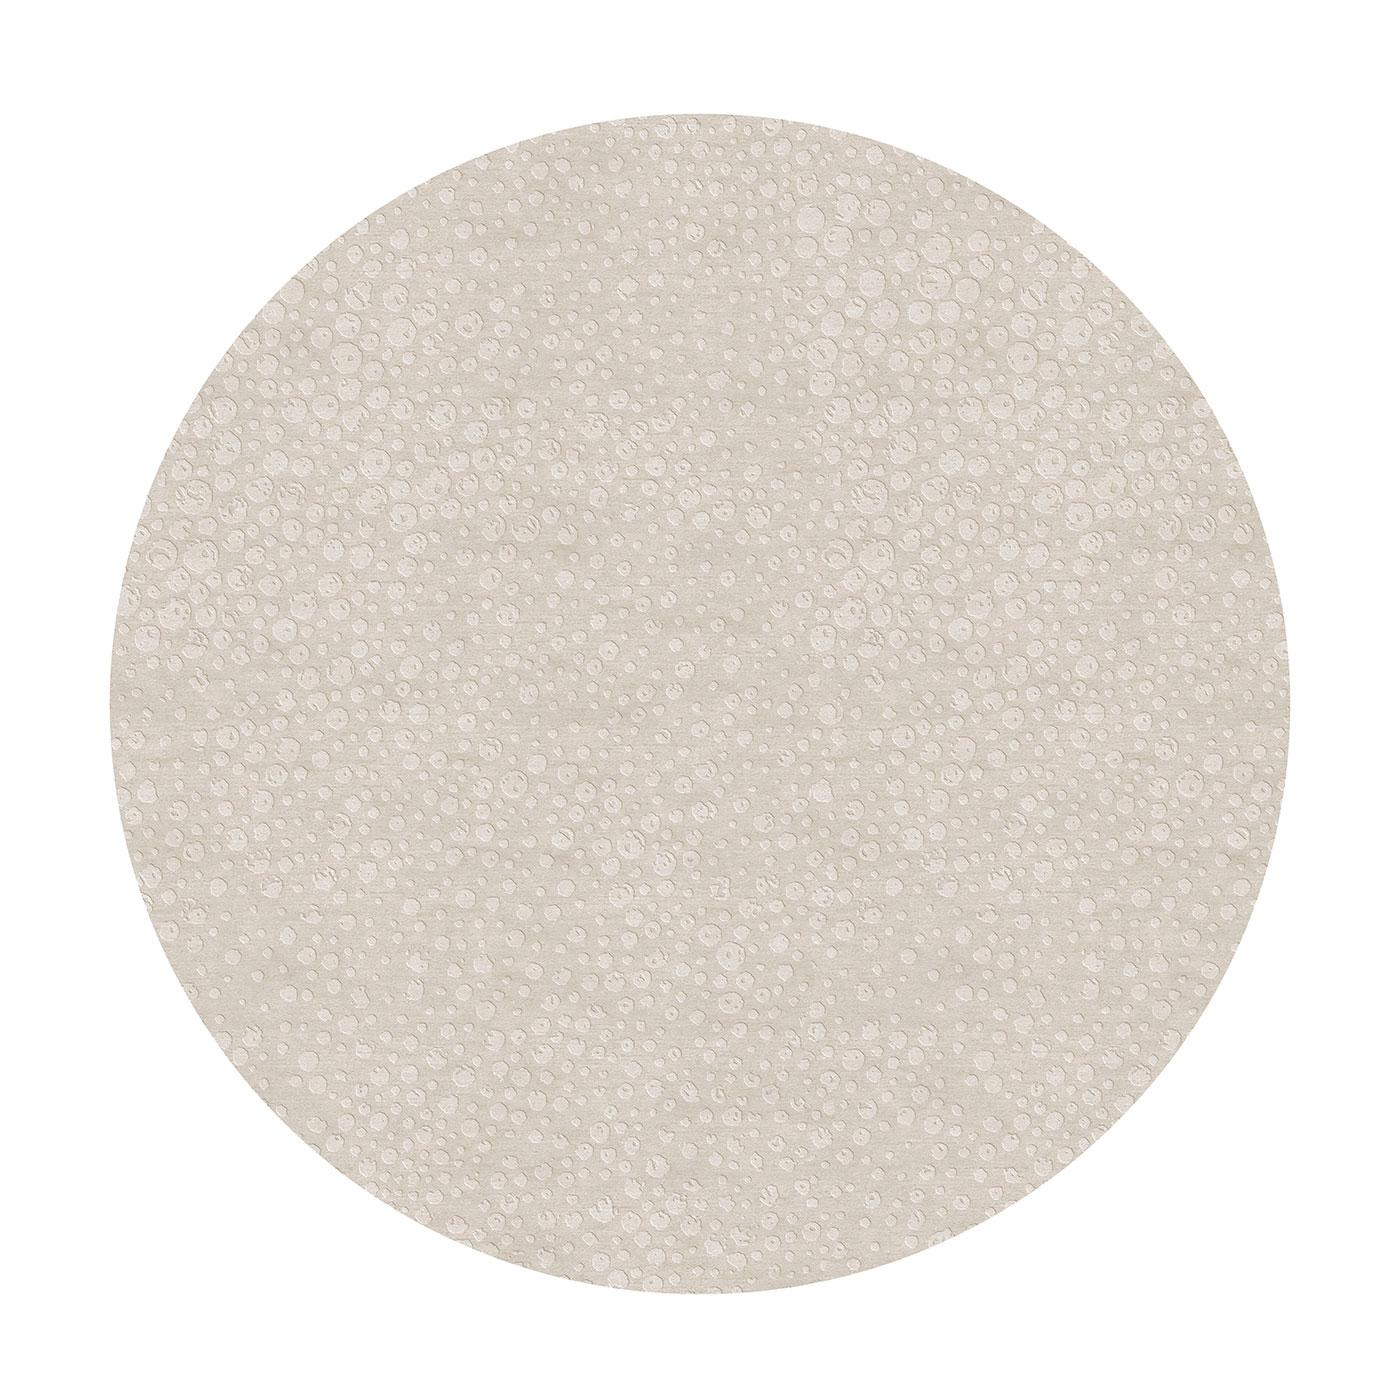 Obegi Home Carpets GA Organic 002